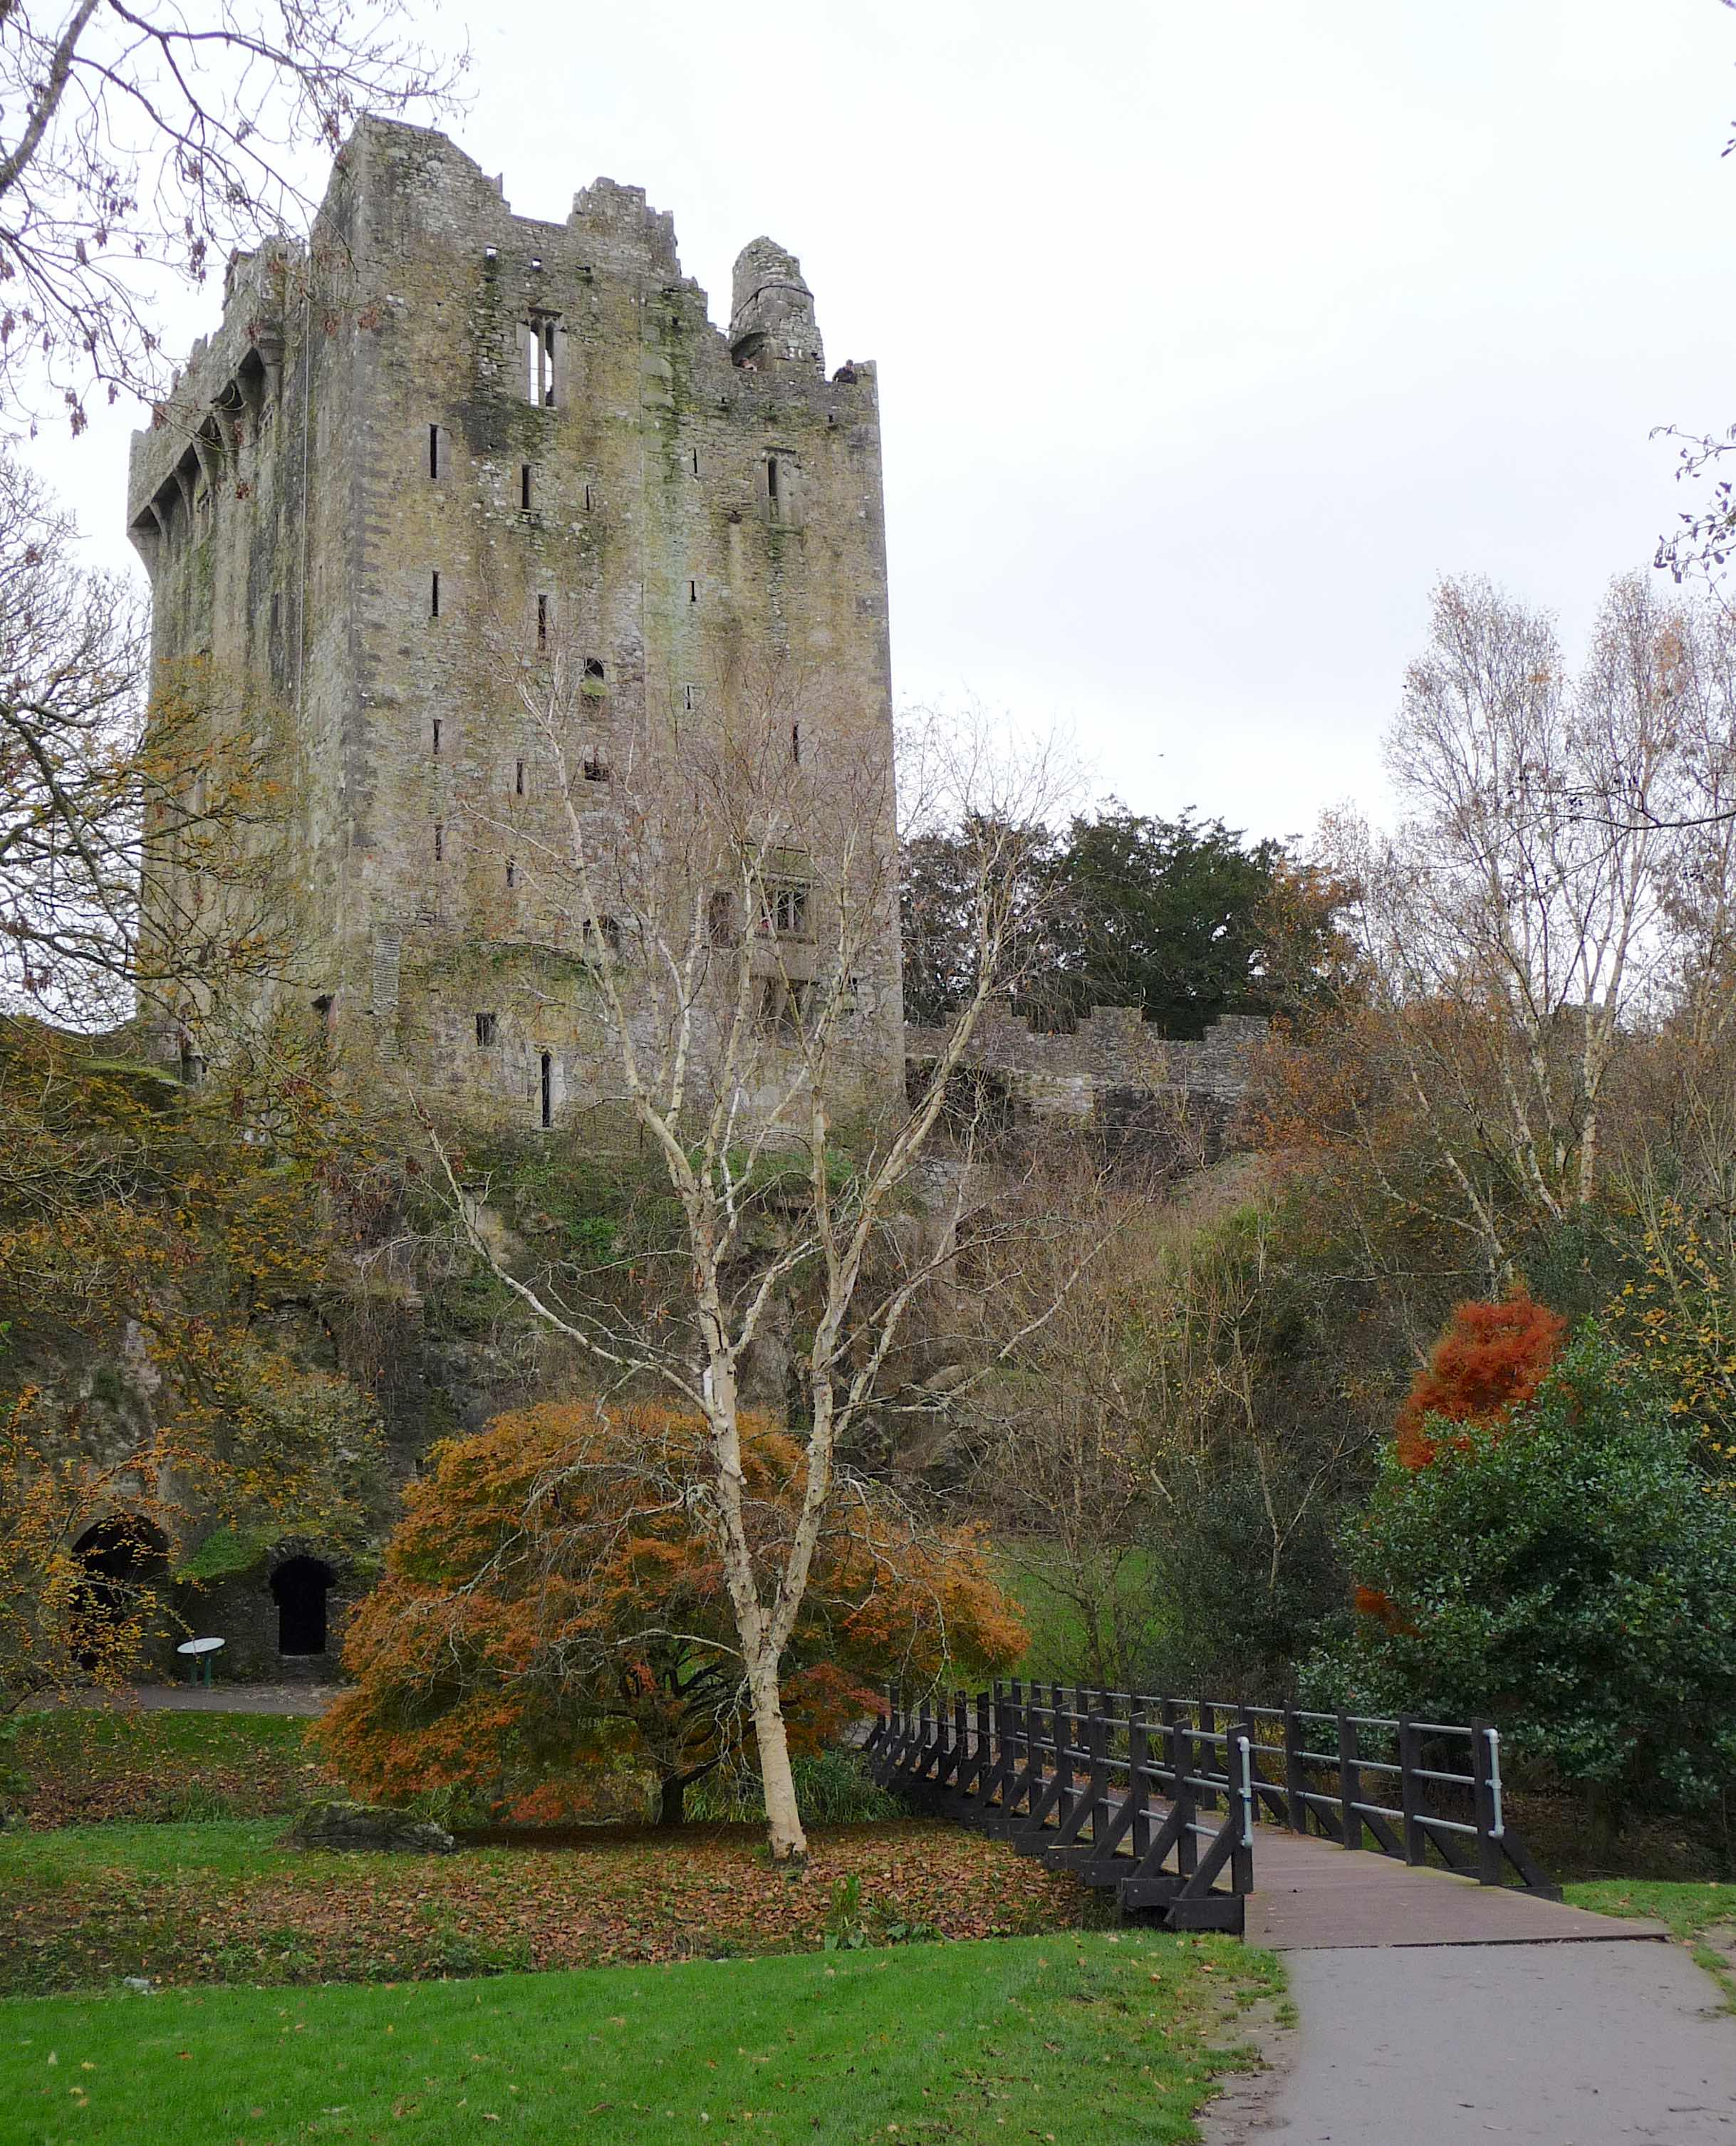 4.Blarney Castle